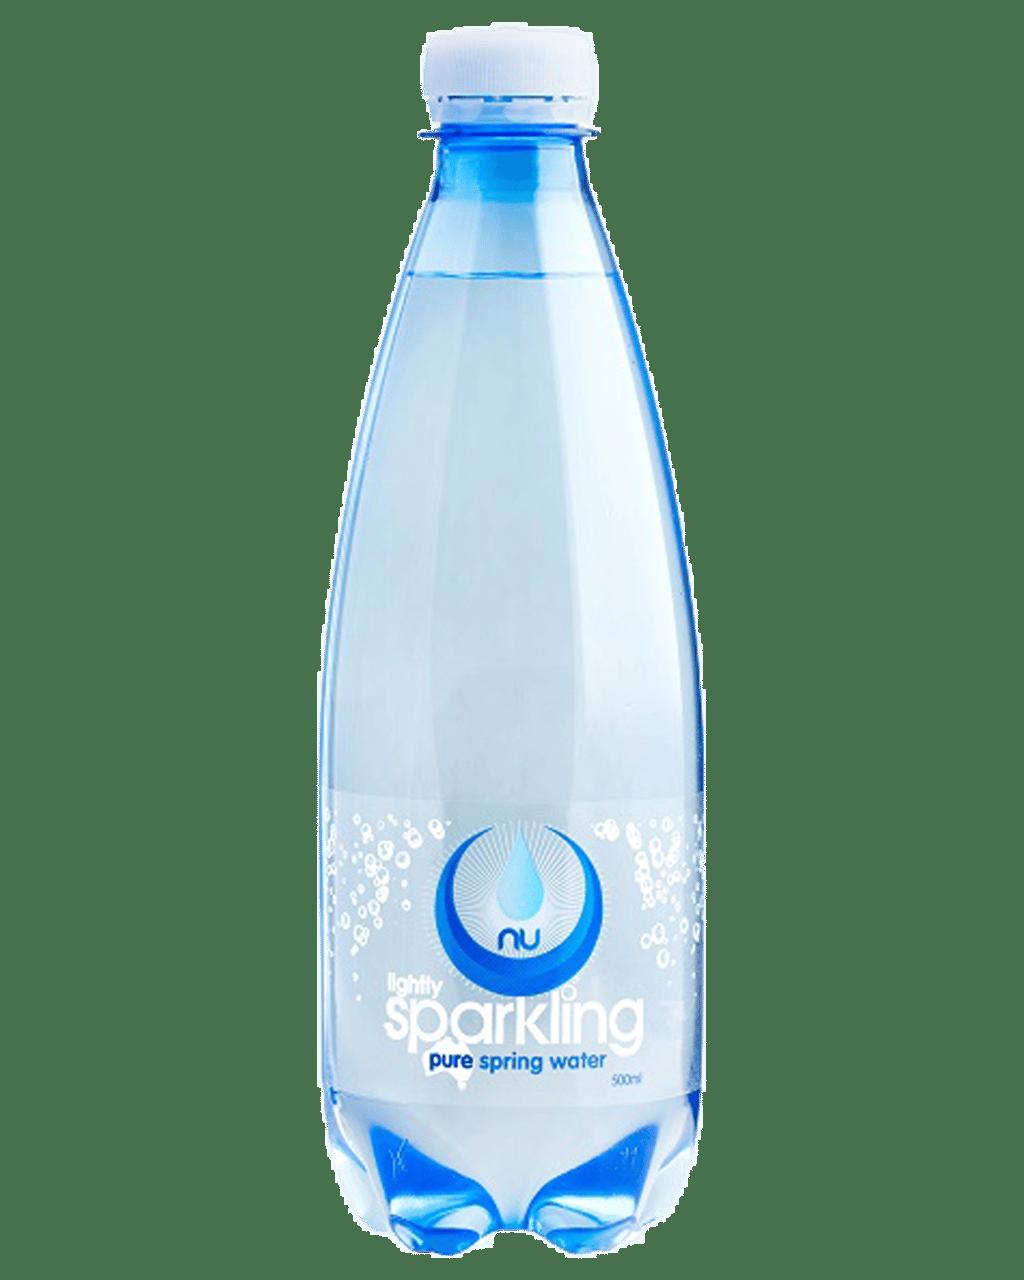 ce3aa3b790 Nu Pure Lightly Sparkling Water Bottles 500mL | Dan Murphy's | Buy ...